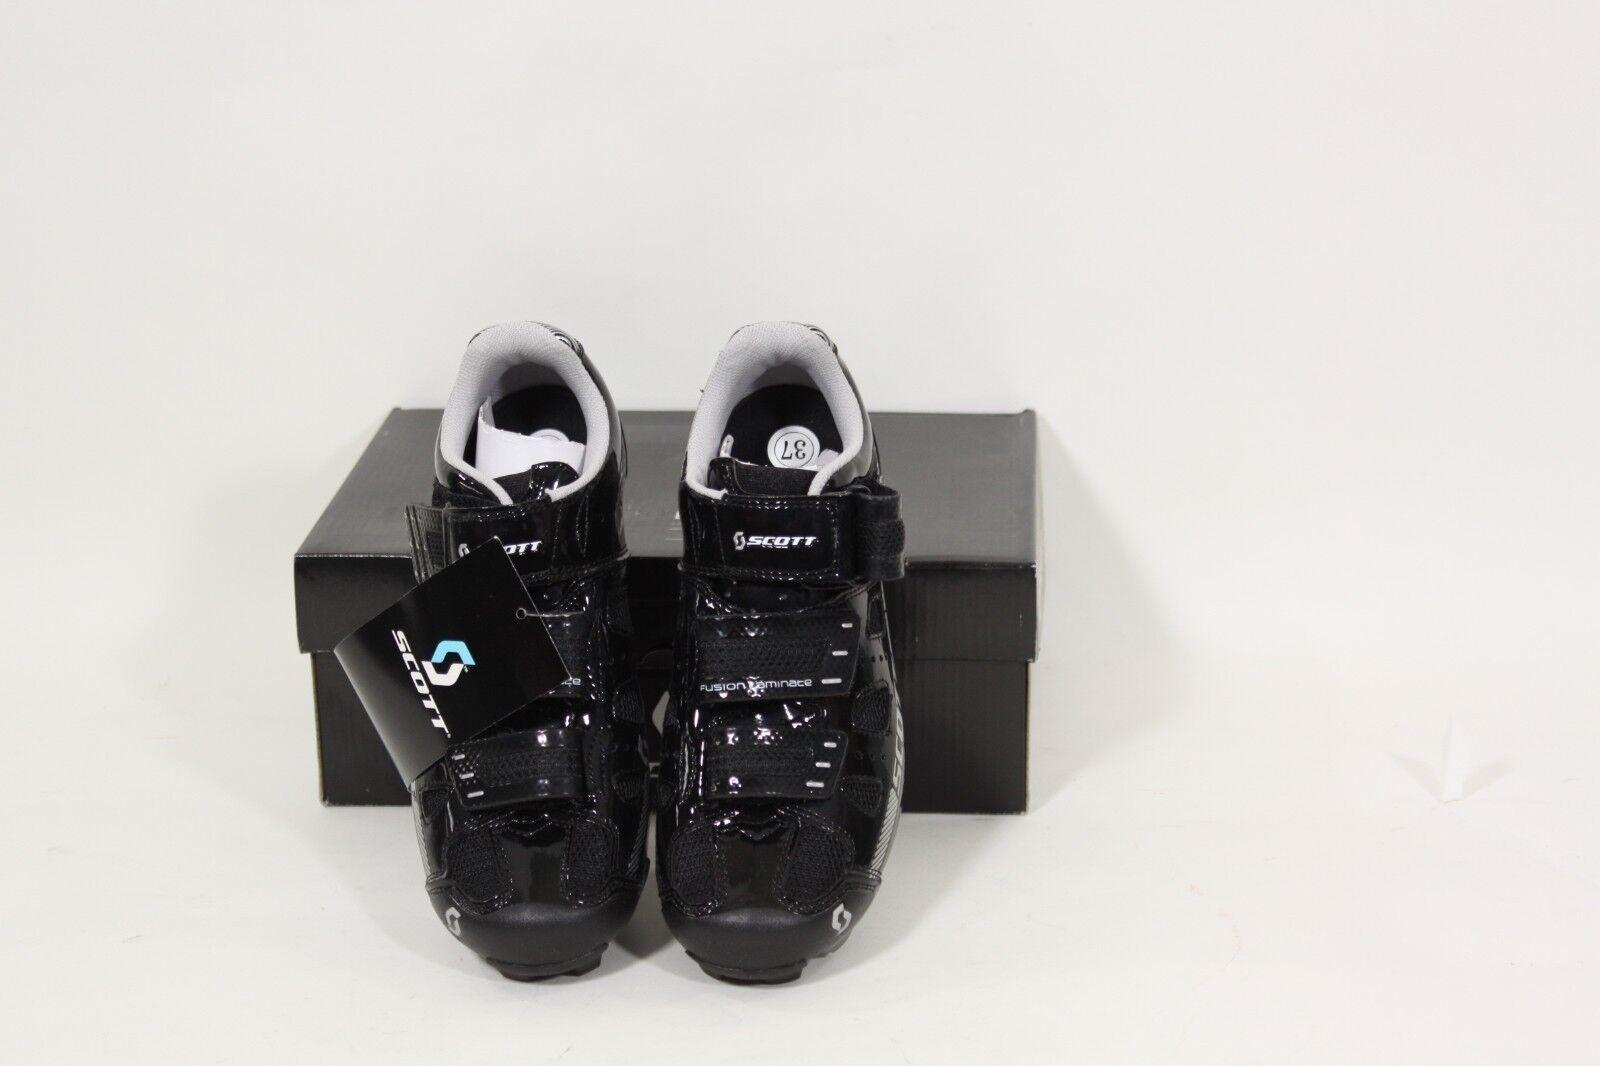 Scott Berg Comp Damen Fahrrad Schuhe Schwarz Eu 38 oder Us 6.5  | Sofortige Lieferung